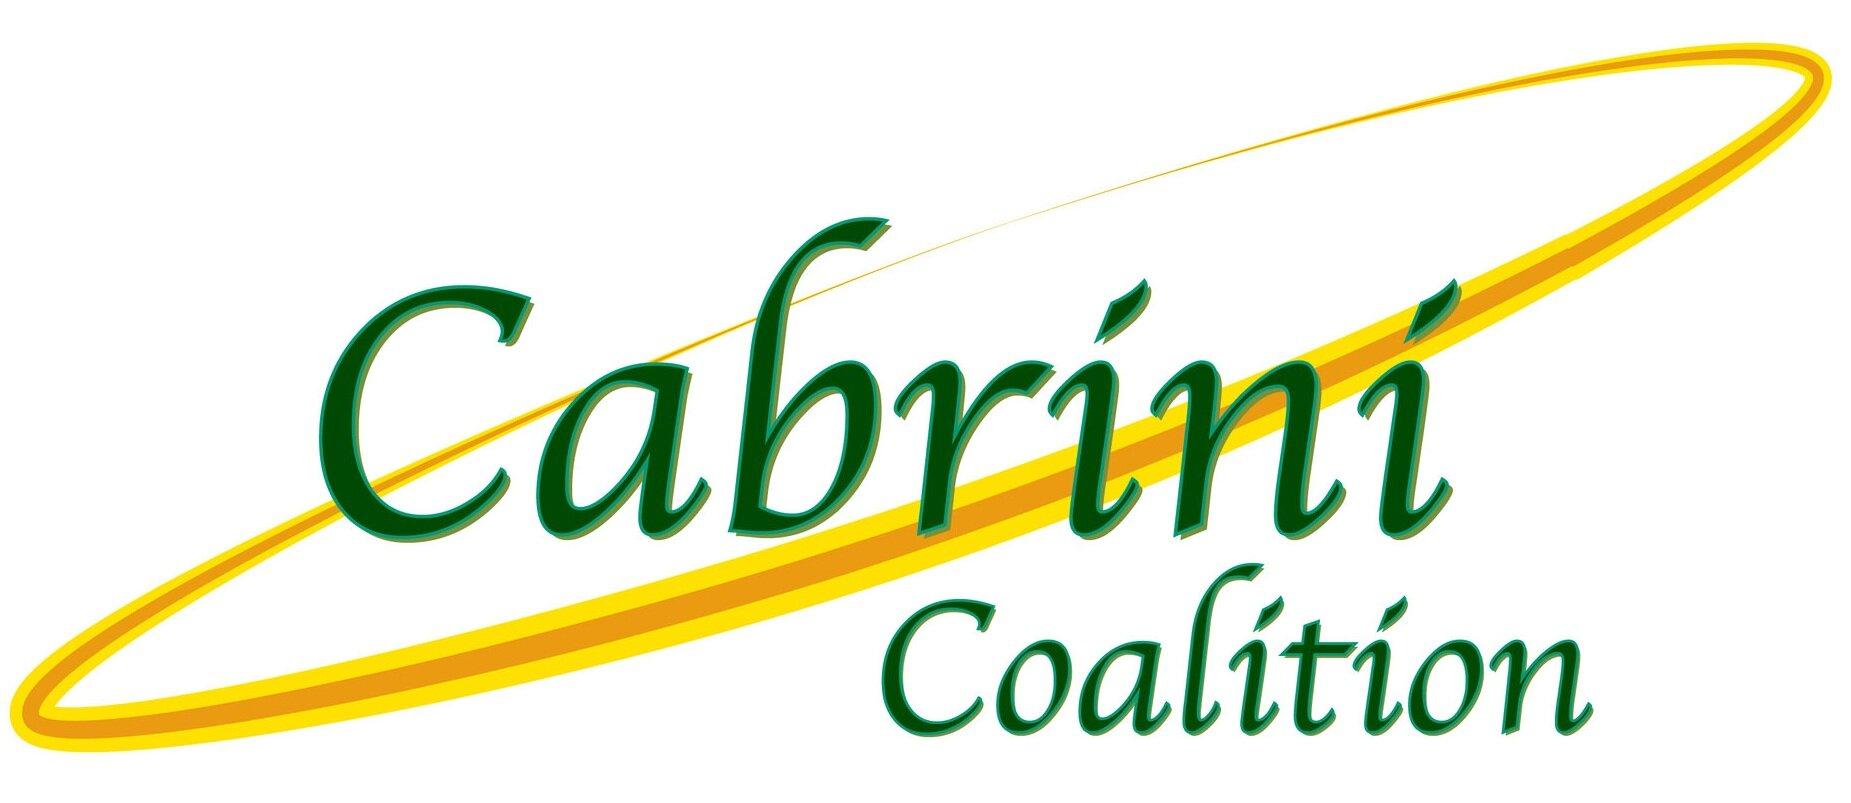 cabrini-coalition-la-mesa-immigrants-immigrant-outreach-the-table-st-francis-de-sales-catholic-church-new-york.jpg